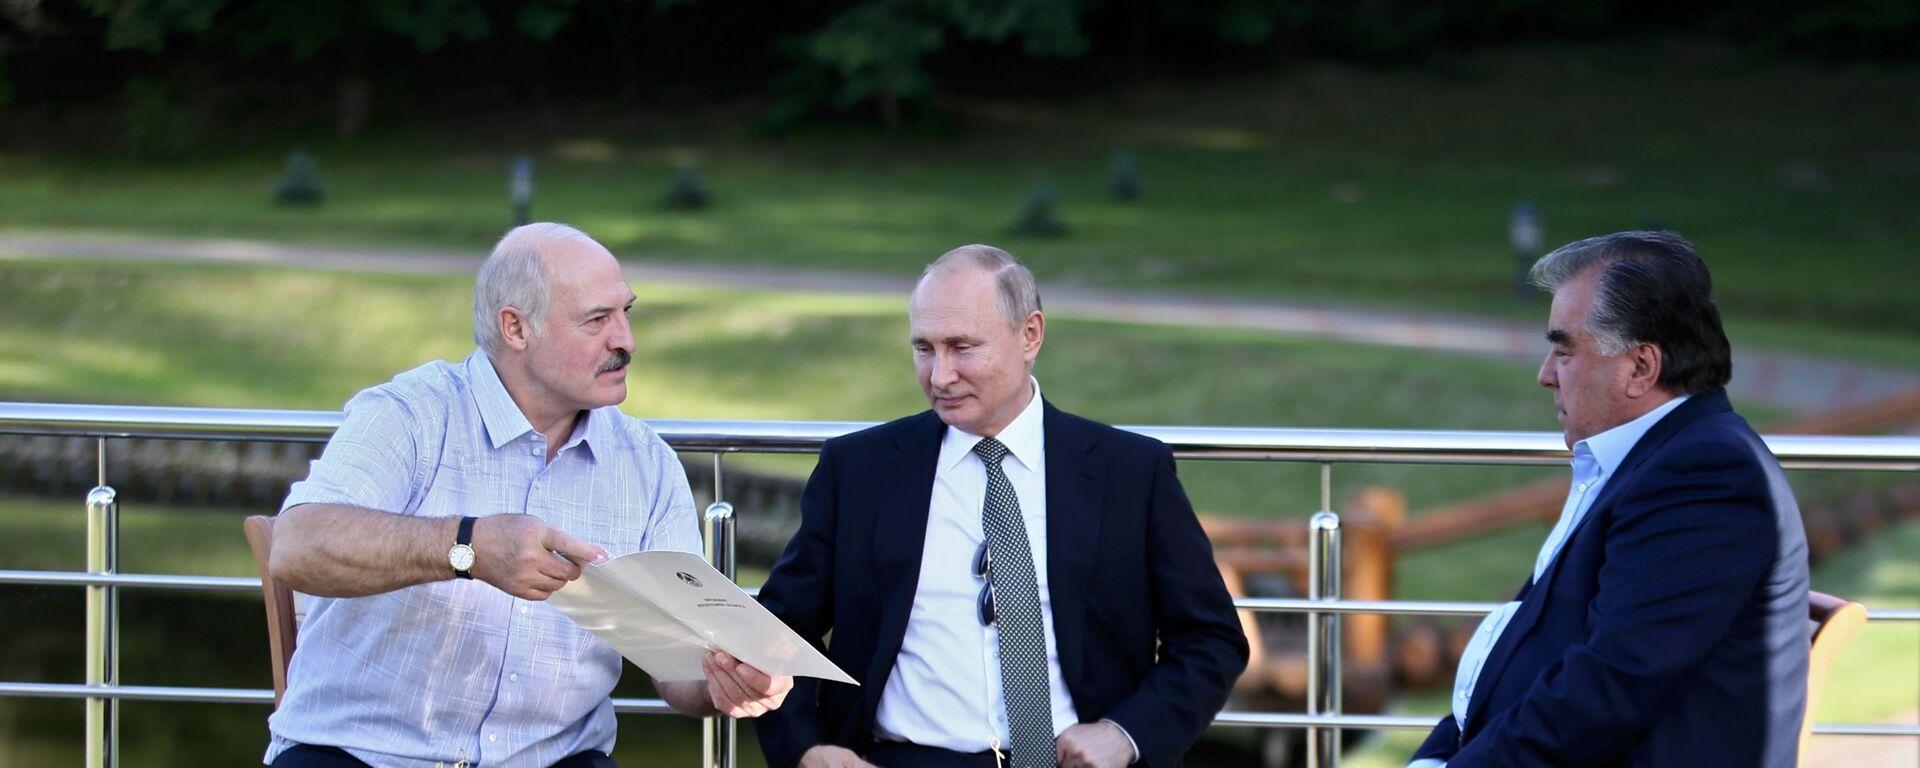 Рабочий визит президента РФ В. Путина в Республику Беларусь - Sputnik Таджикистан, 1920, 30.08.2021